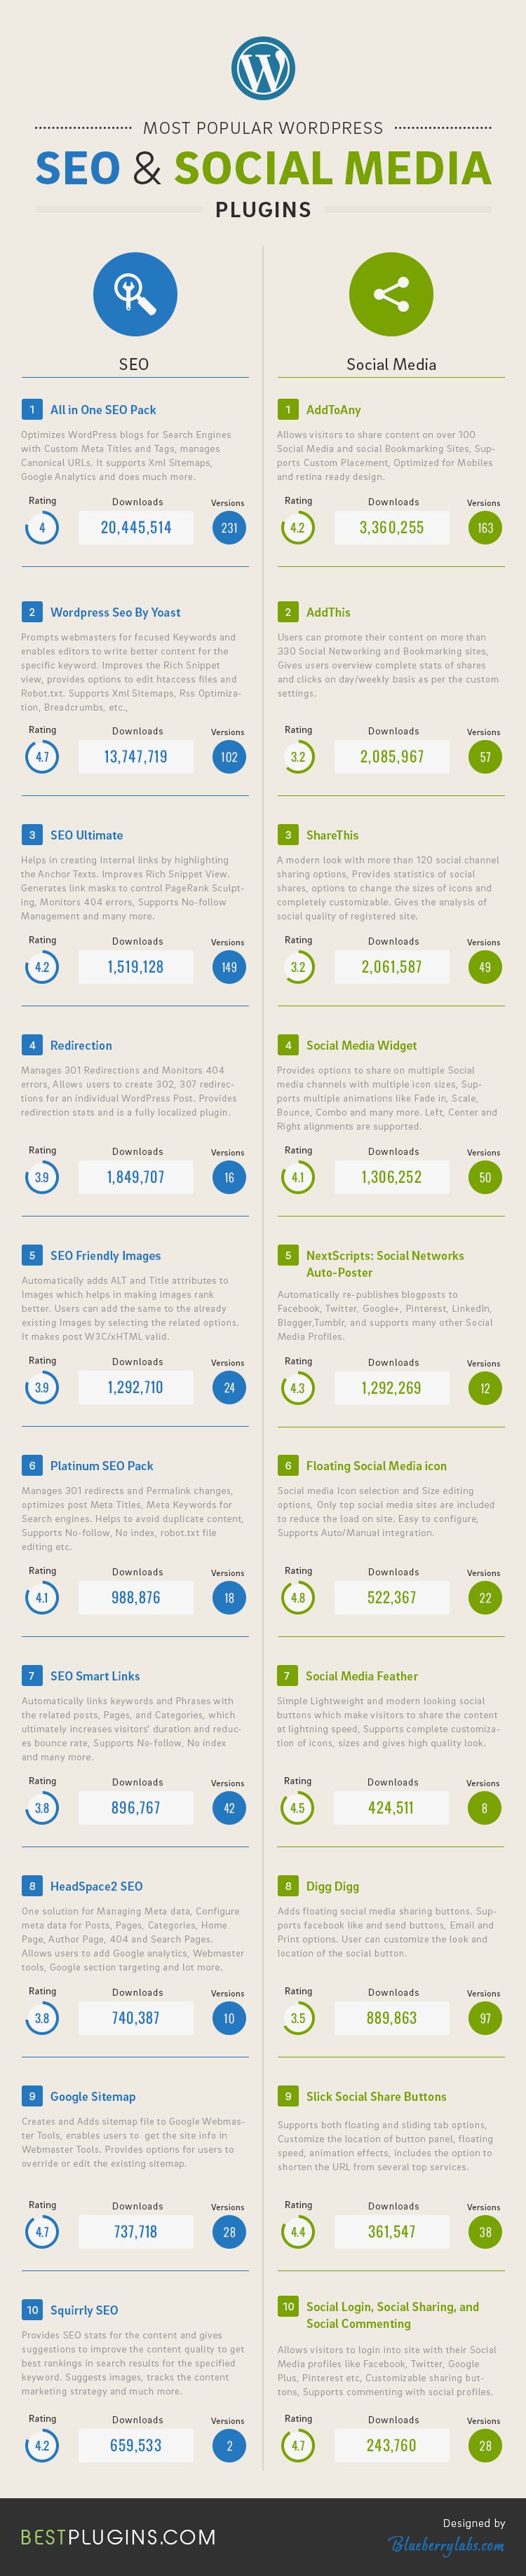 SEO vs Social Media WordPress Plugins